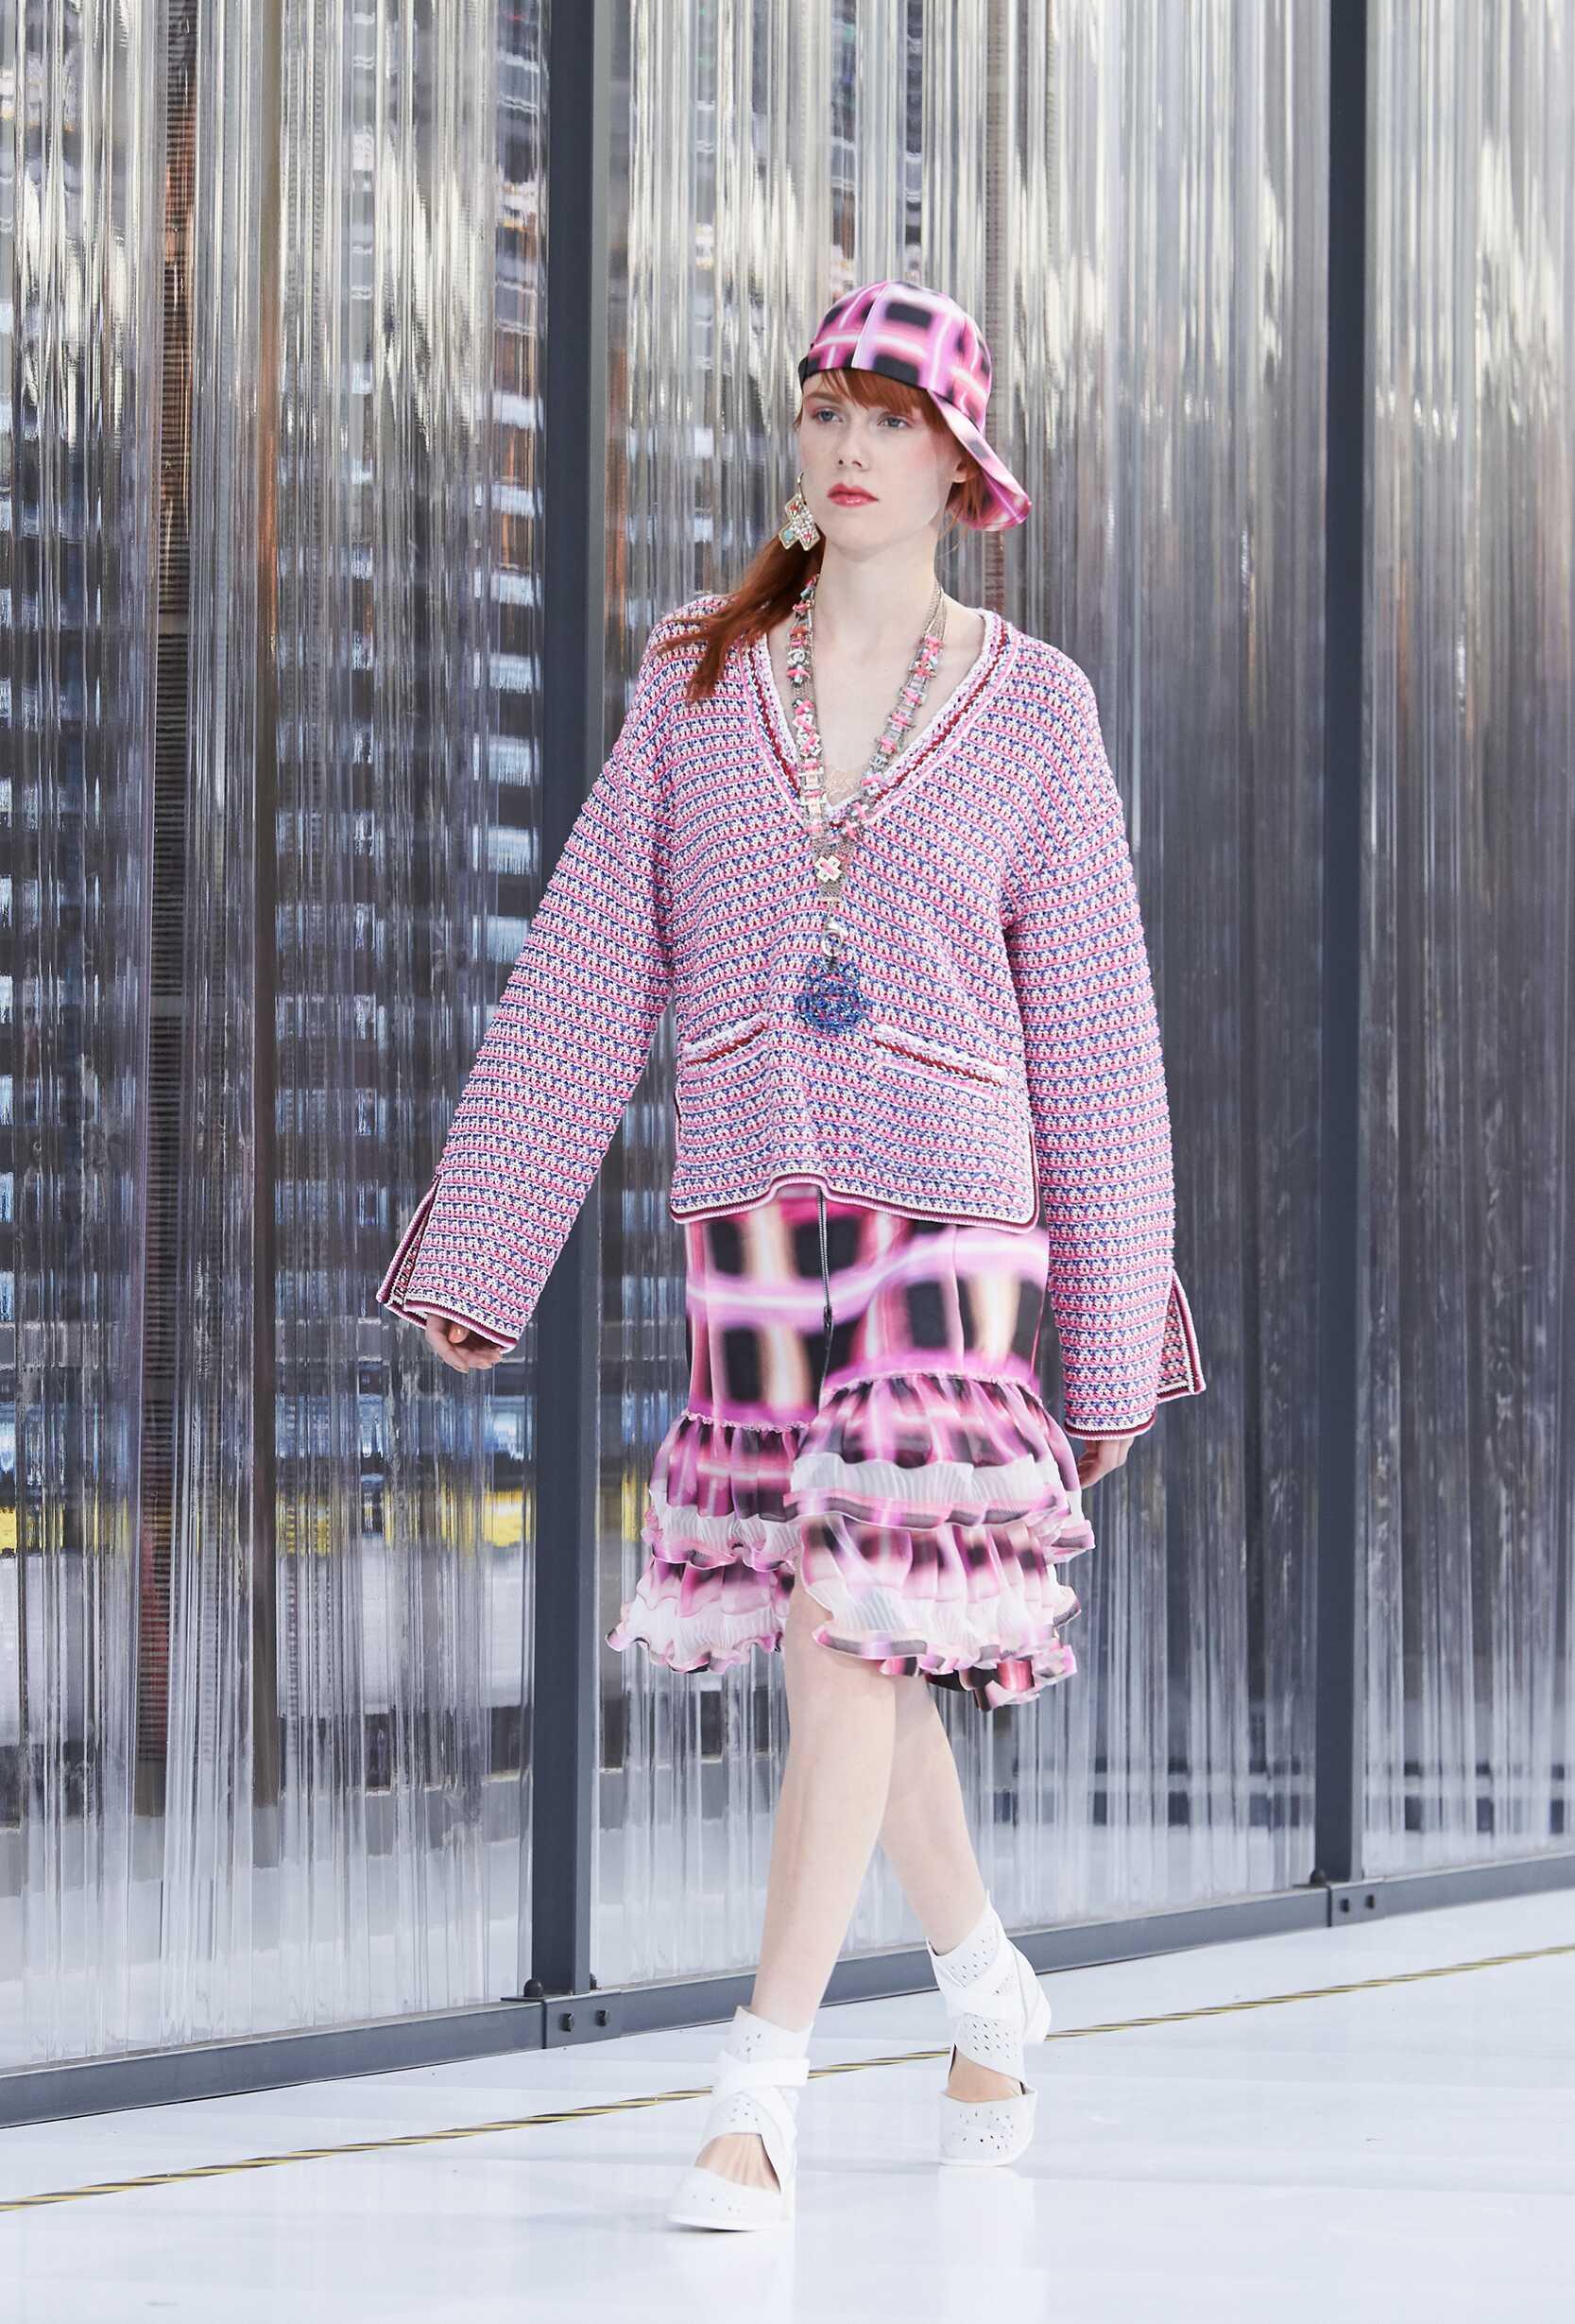 SS 2017 Chanel Fashion Show Paris Fashion Week